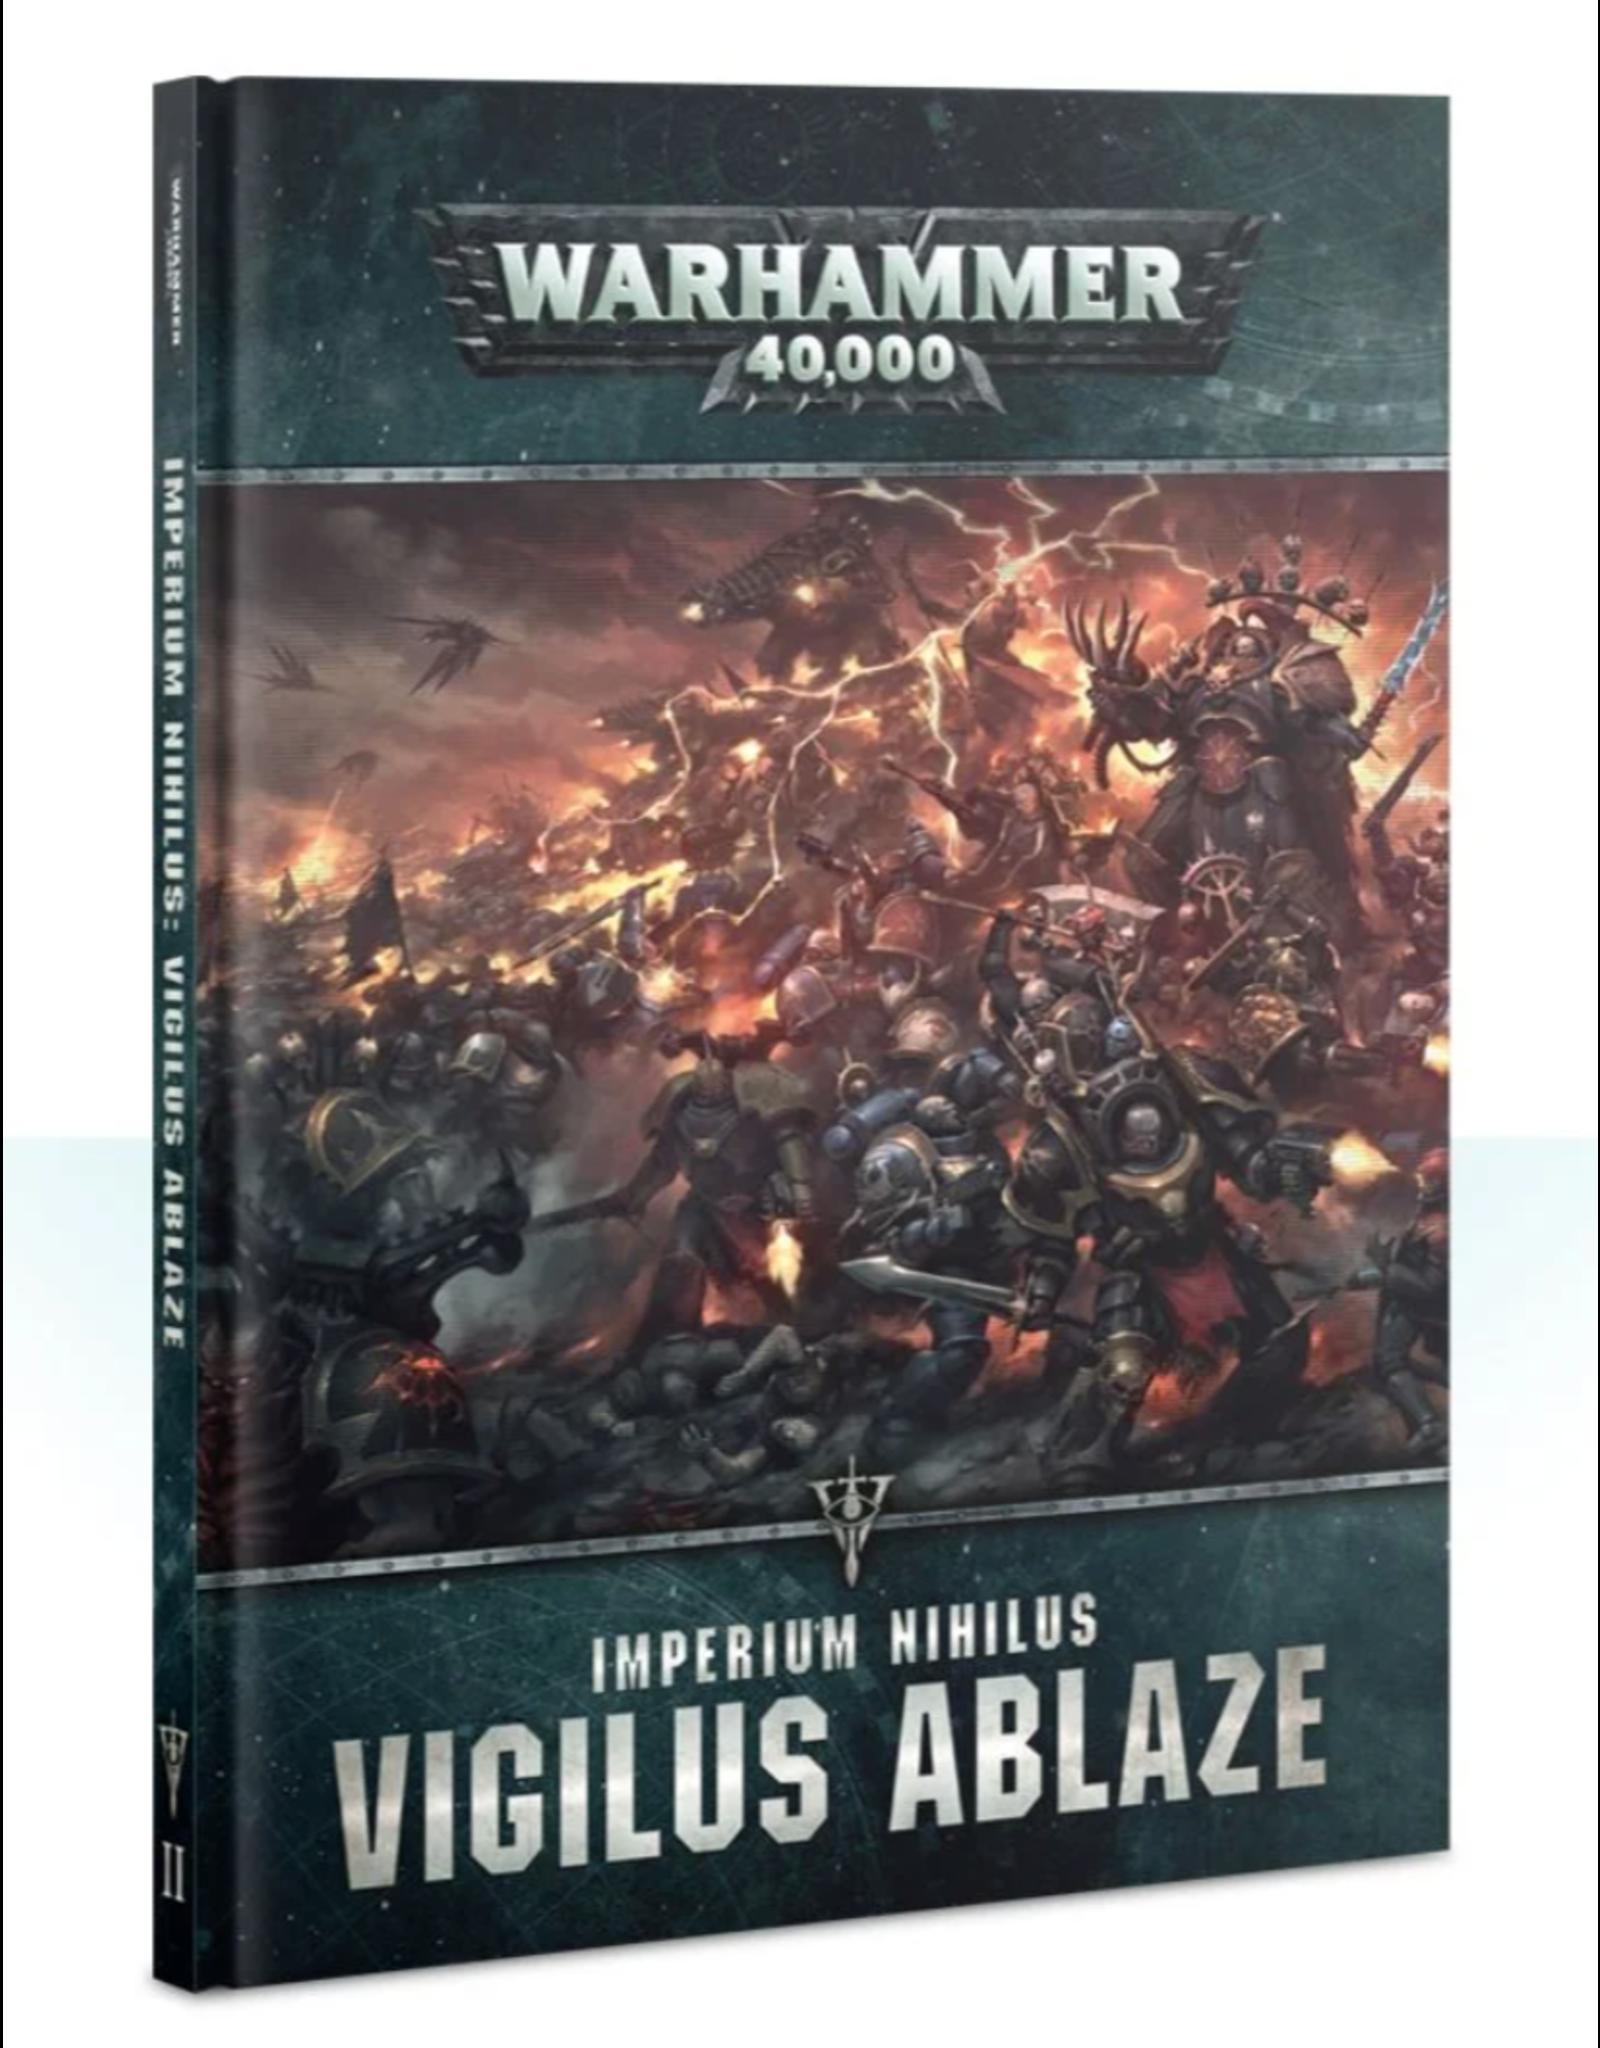 Warhammer 40K Imperium Nihilus: Vigilus Ablaze